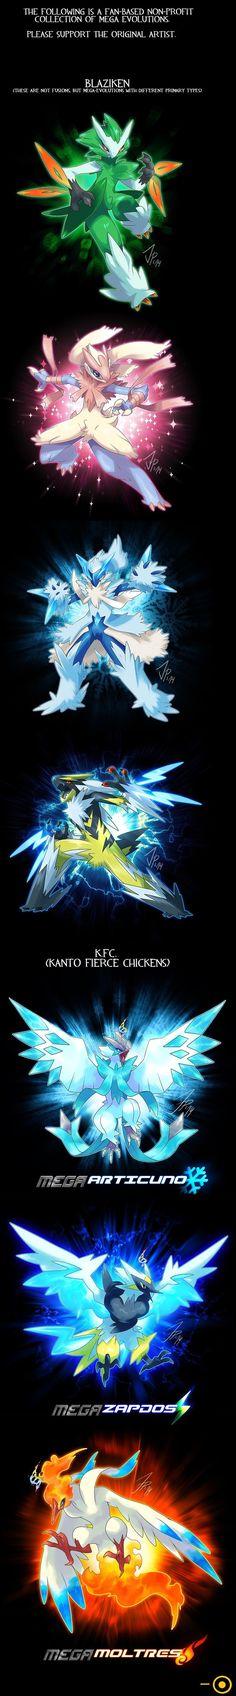 BLAZIKEN in different type and legendary birds mega evolution